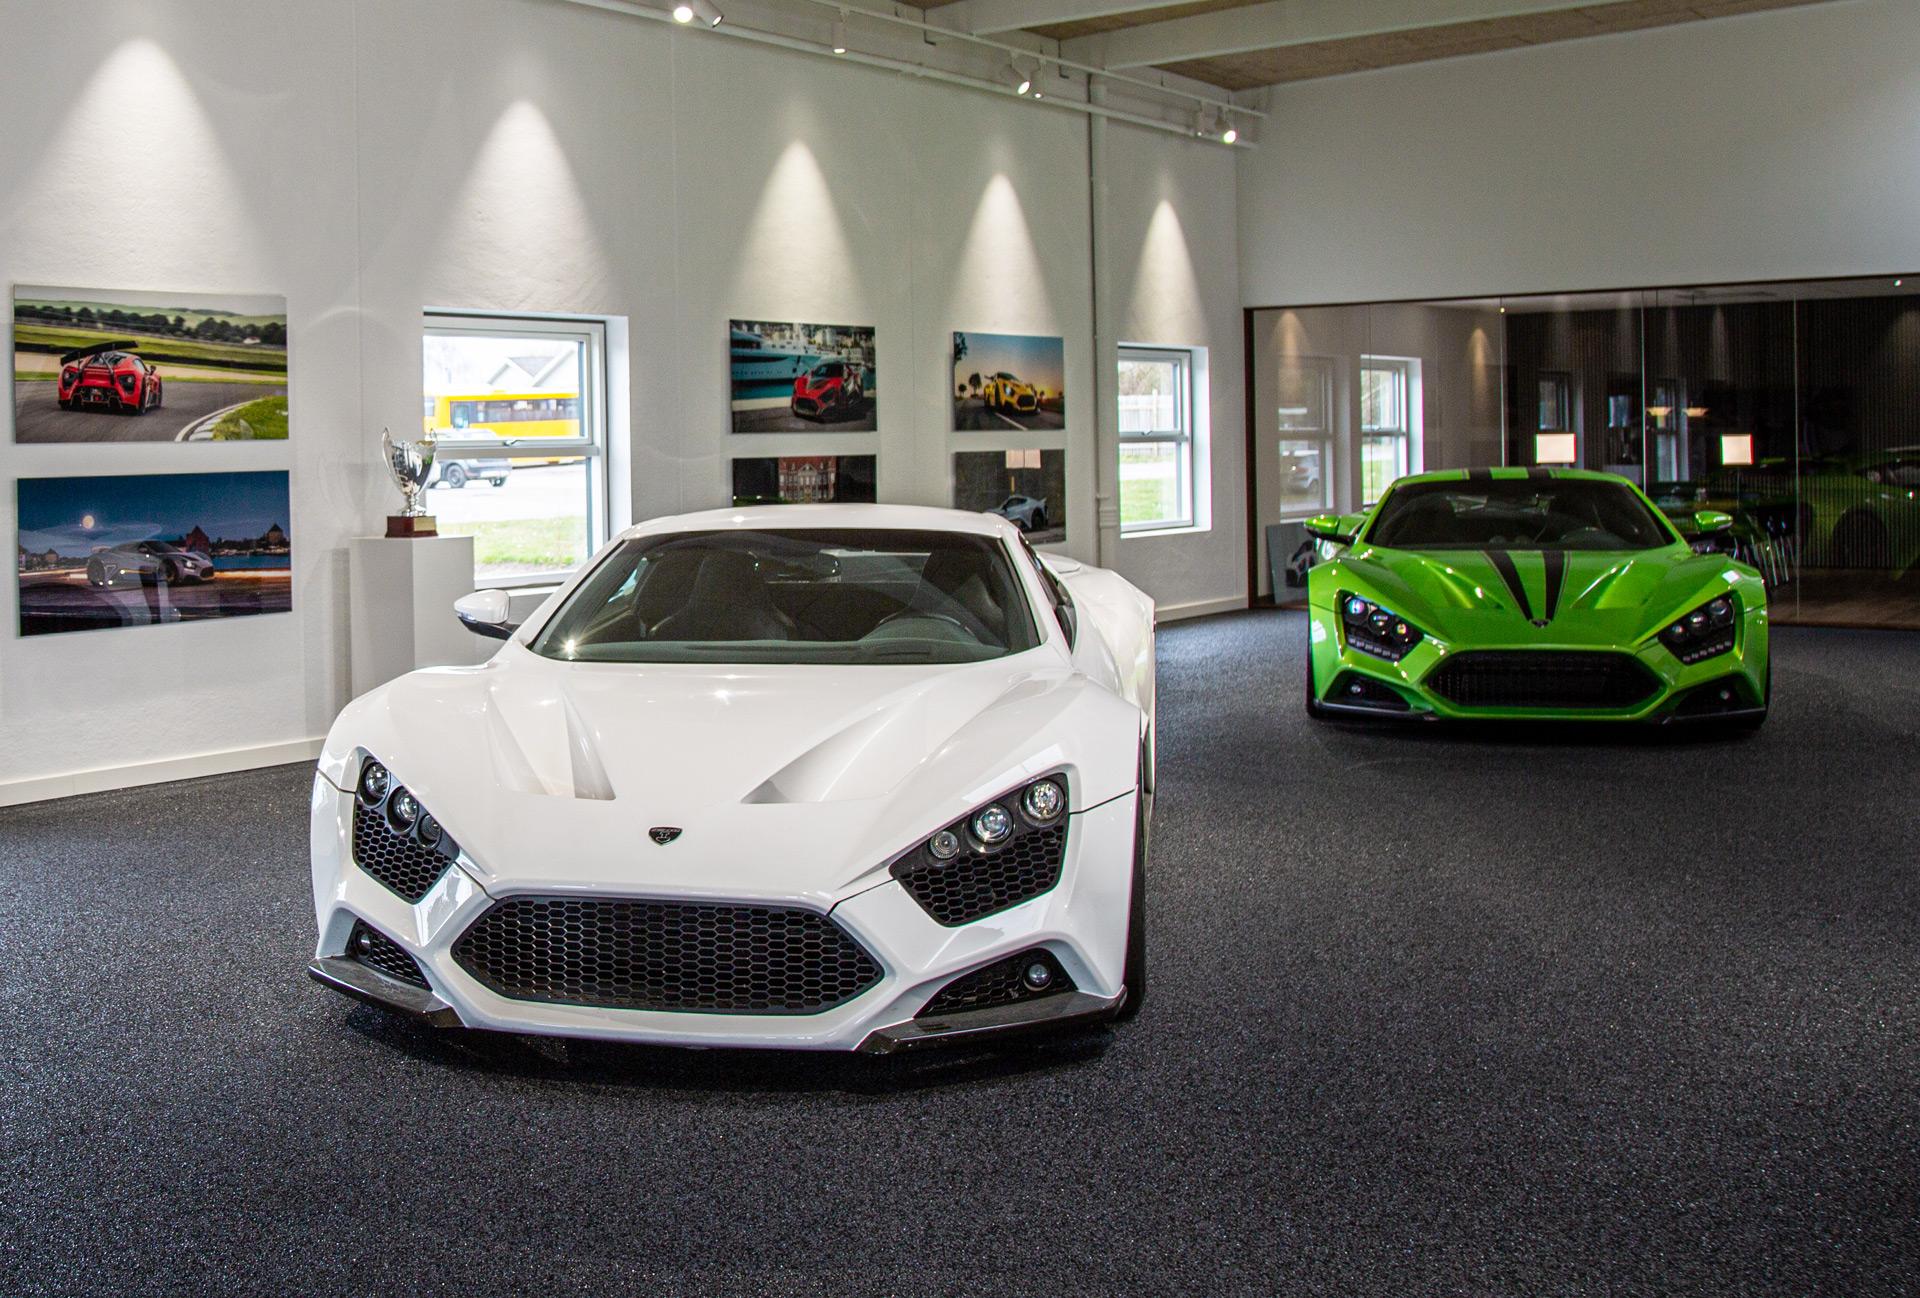 Zenvo upgrades plant, still building 5 cars per year